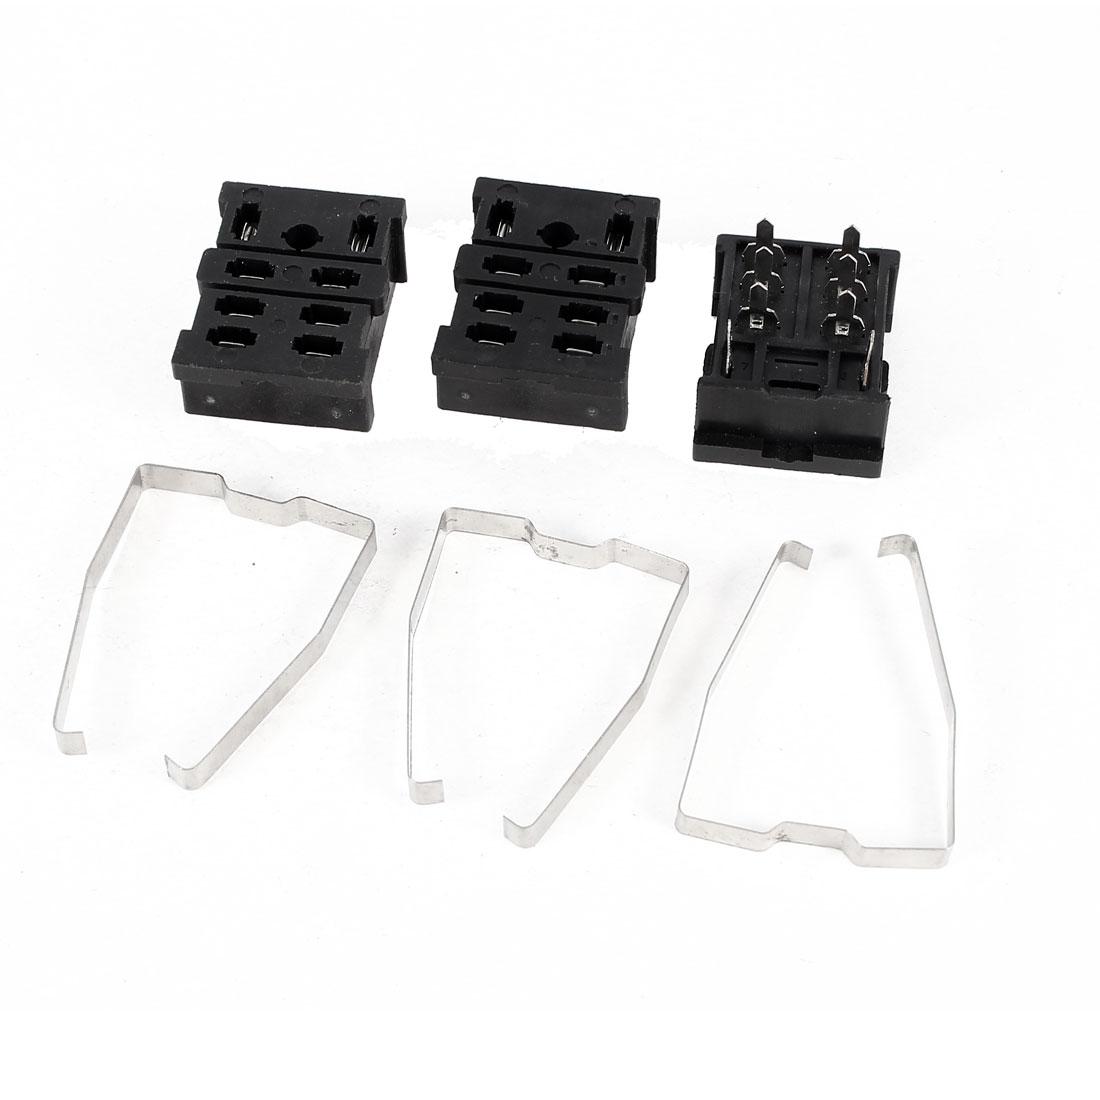 3 Pcs PCB Board Mounted Soldering 8 Pin Voltage Relay Socket Base Holder 10A 300V Black